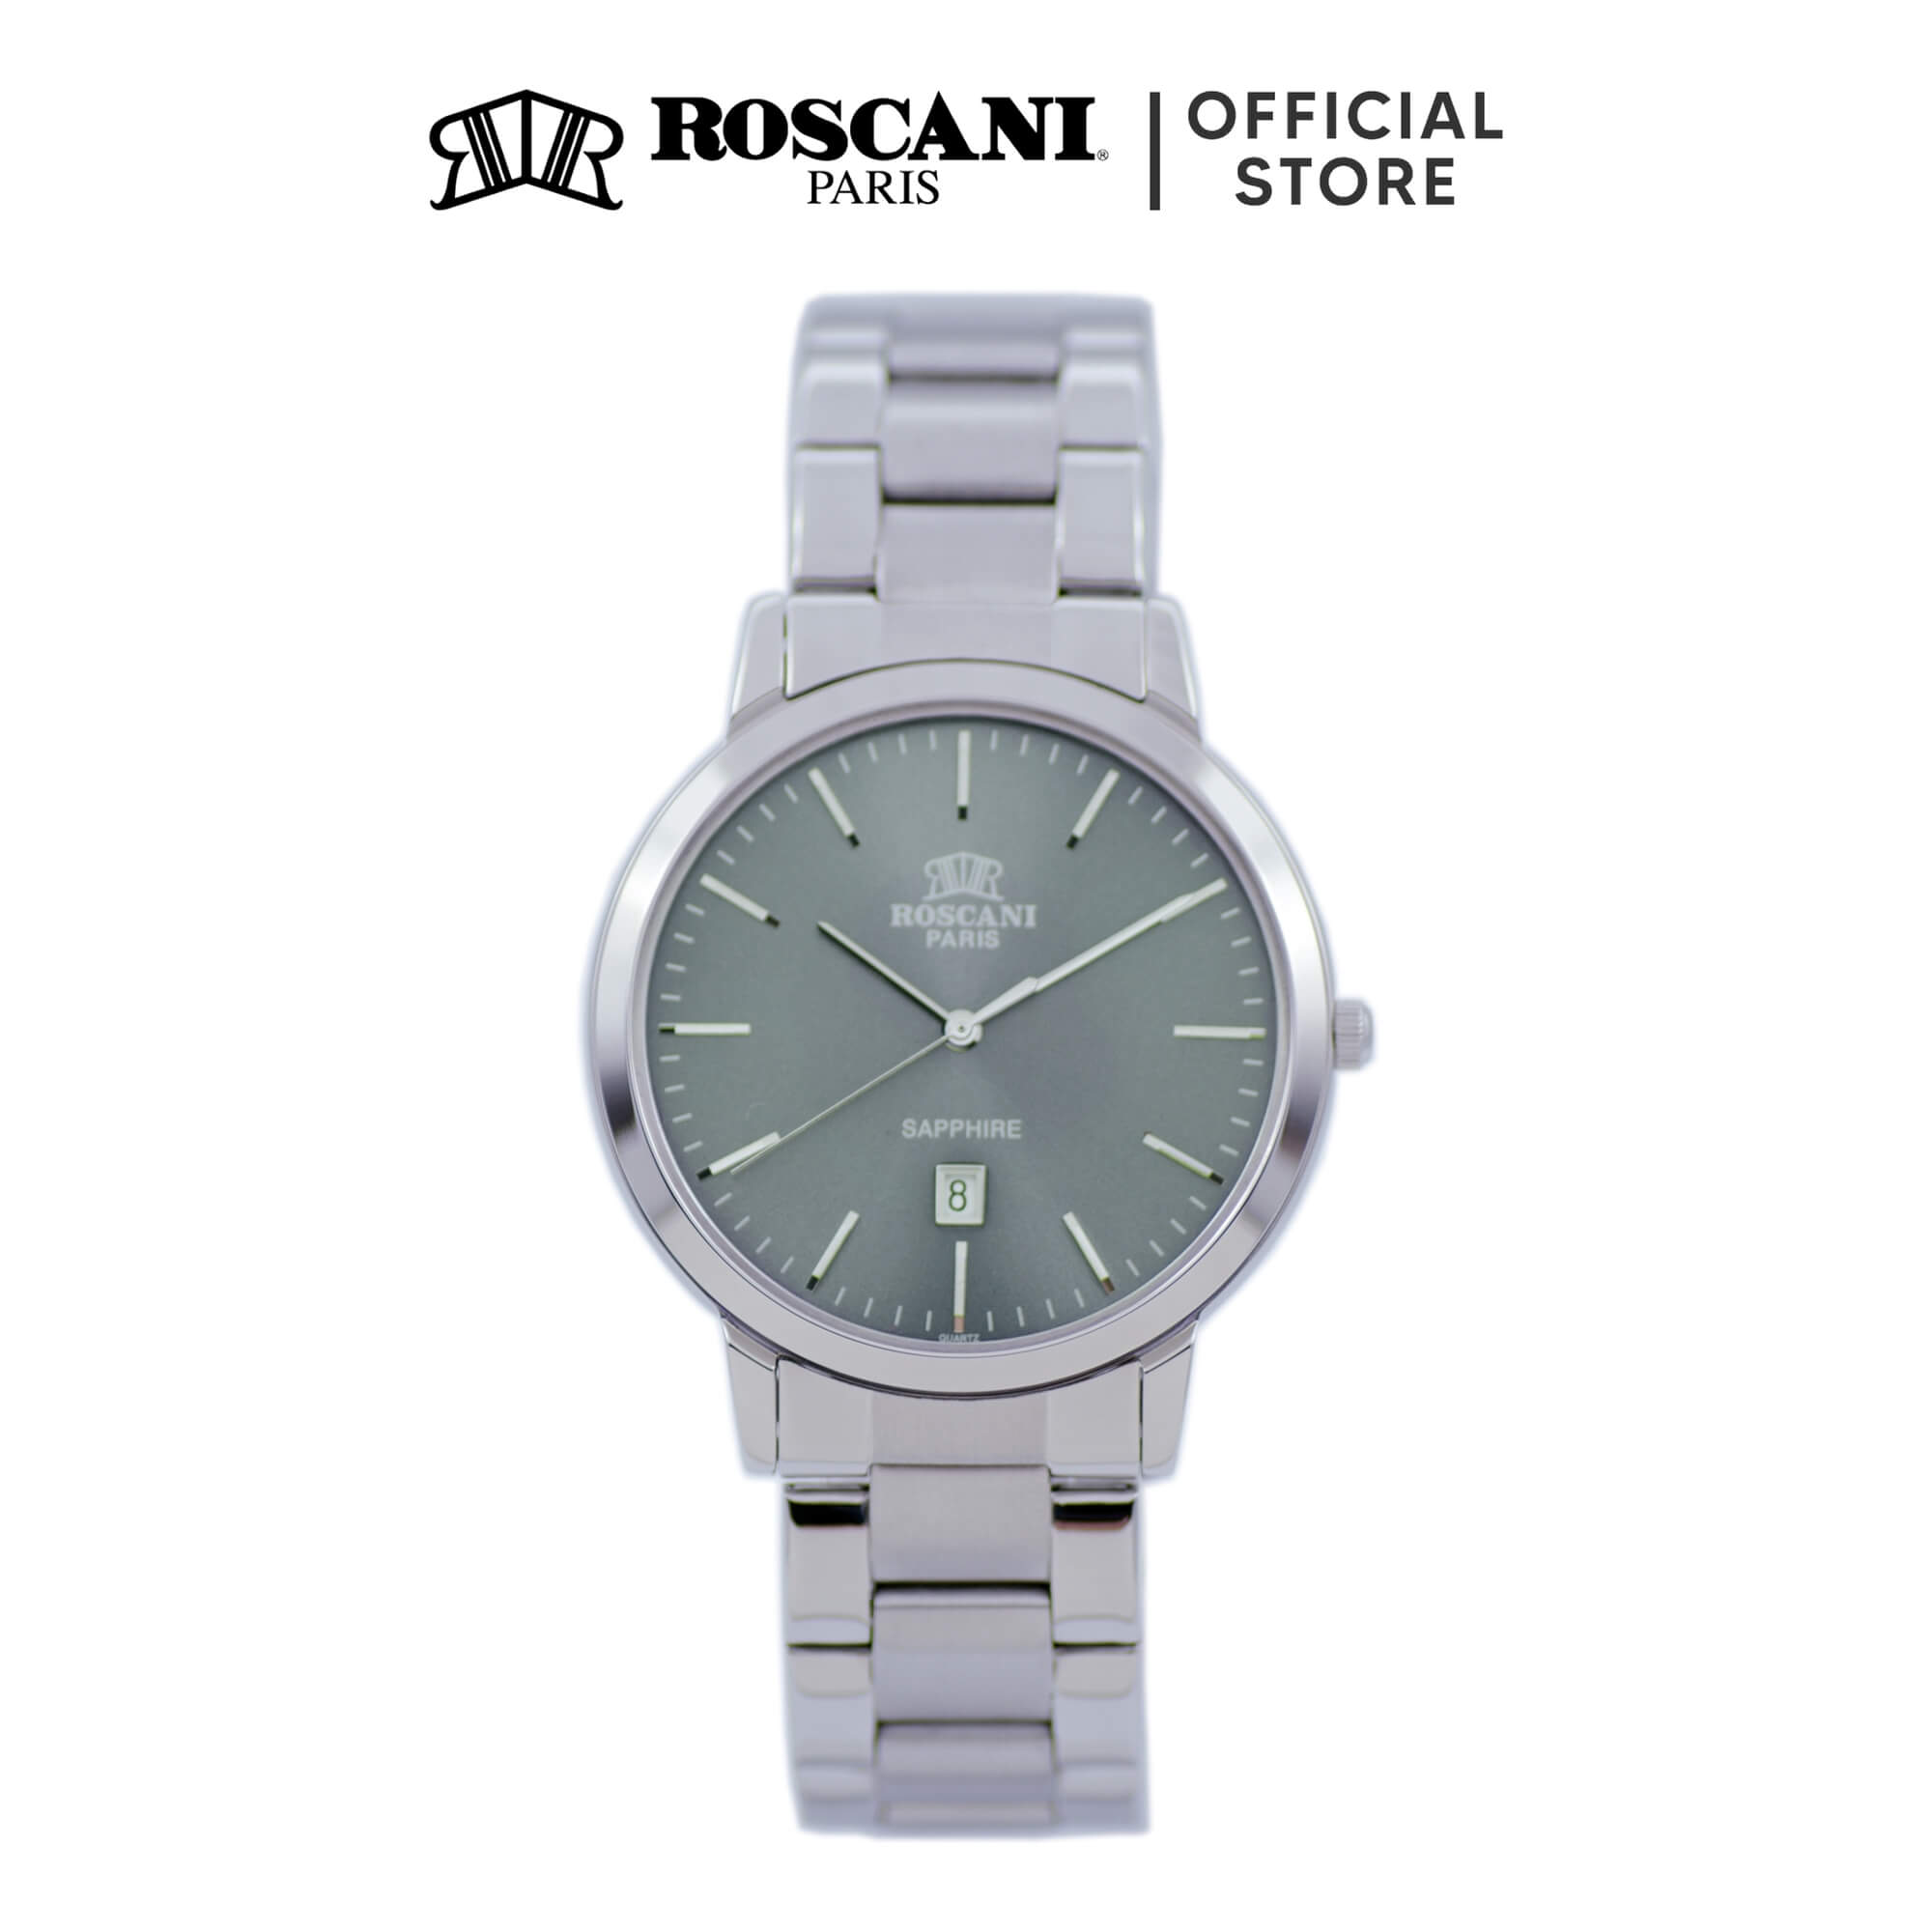 Roscani Presley 407 (Sunray Dial + Sapphire Crystal) Bracelet Men Watch